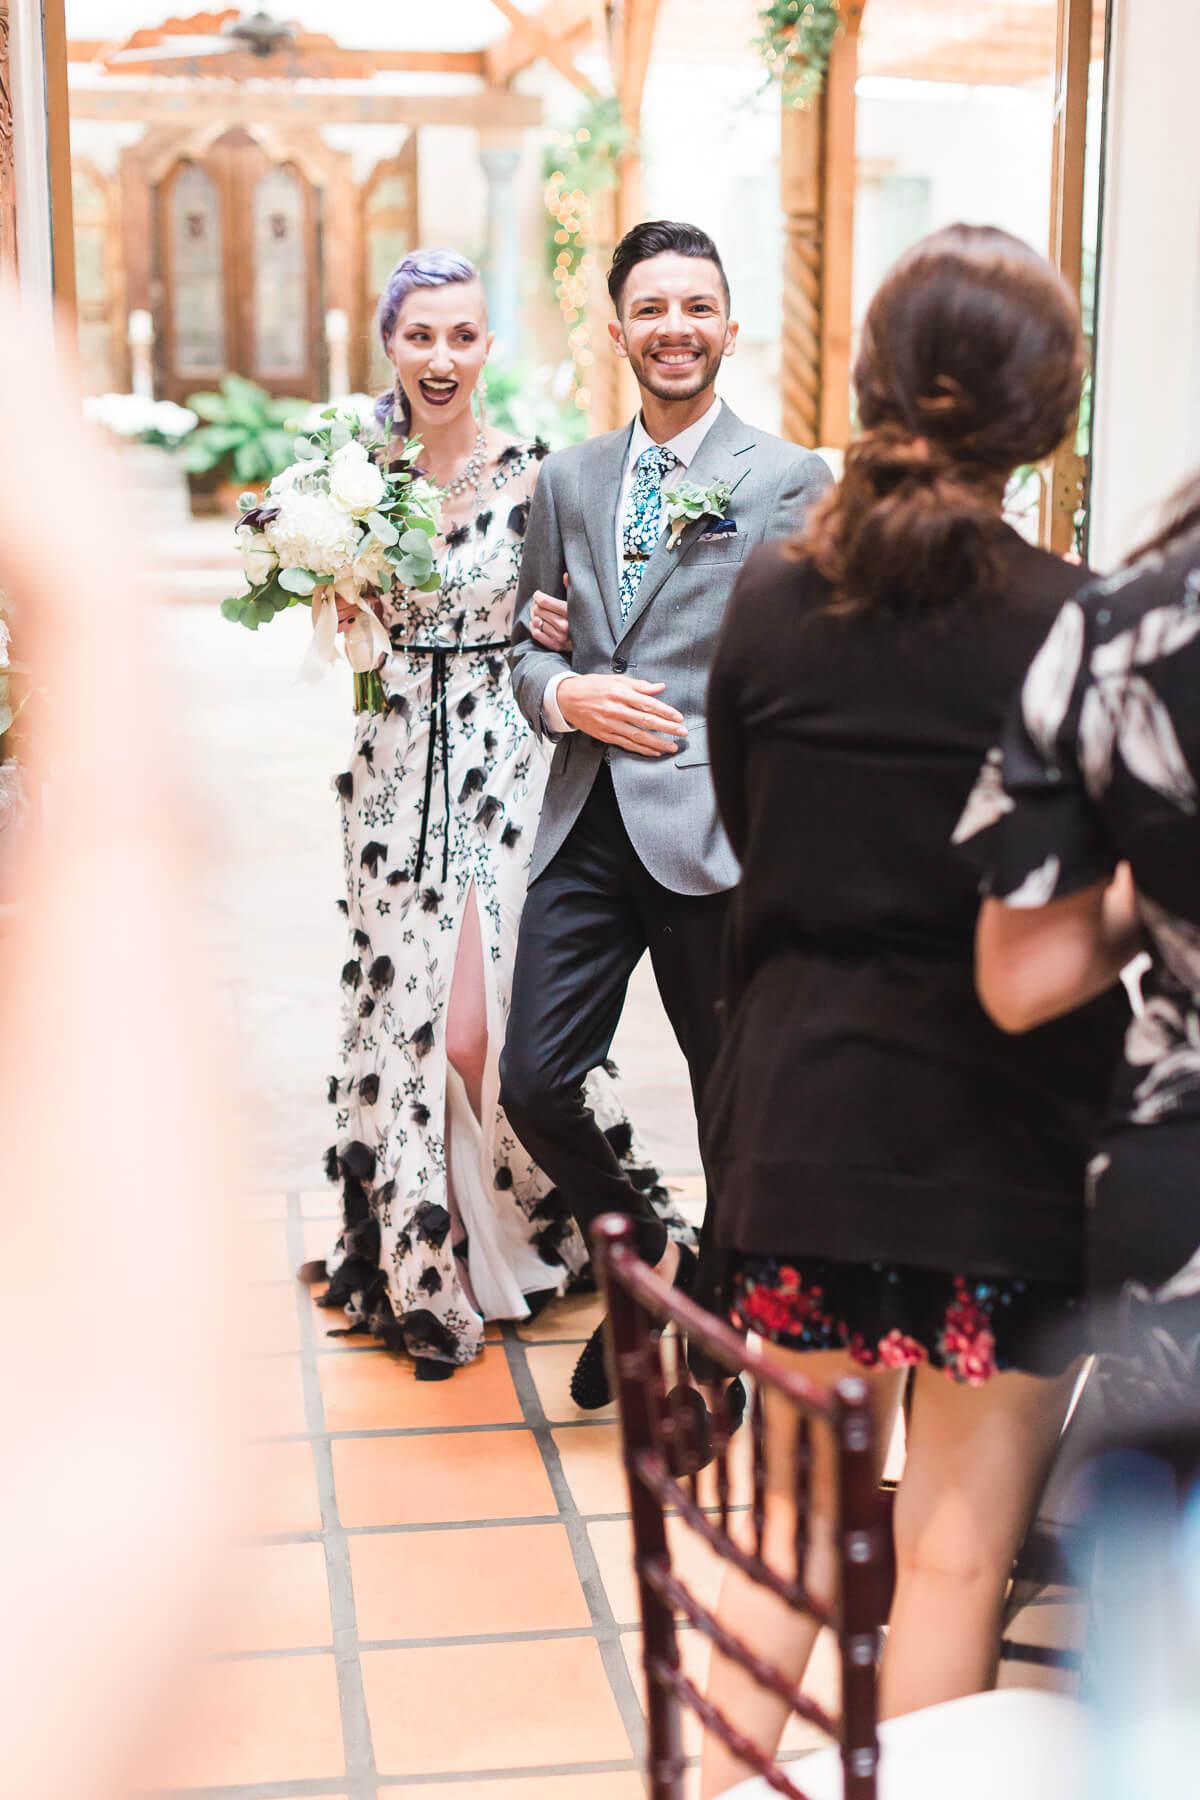 the_light_and_glass-wedding-photography-kim-jon-120.jpg